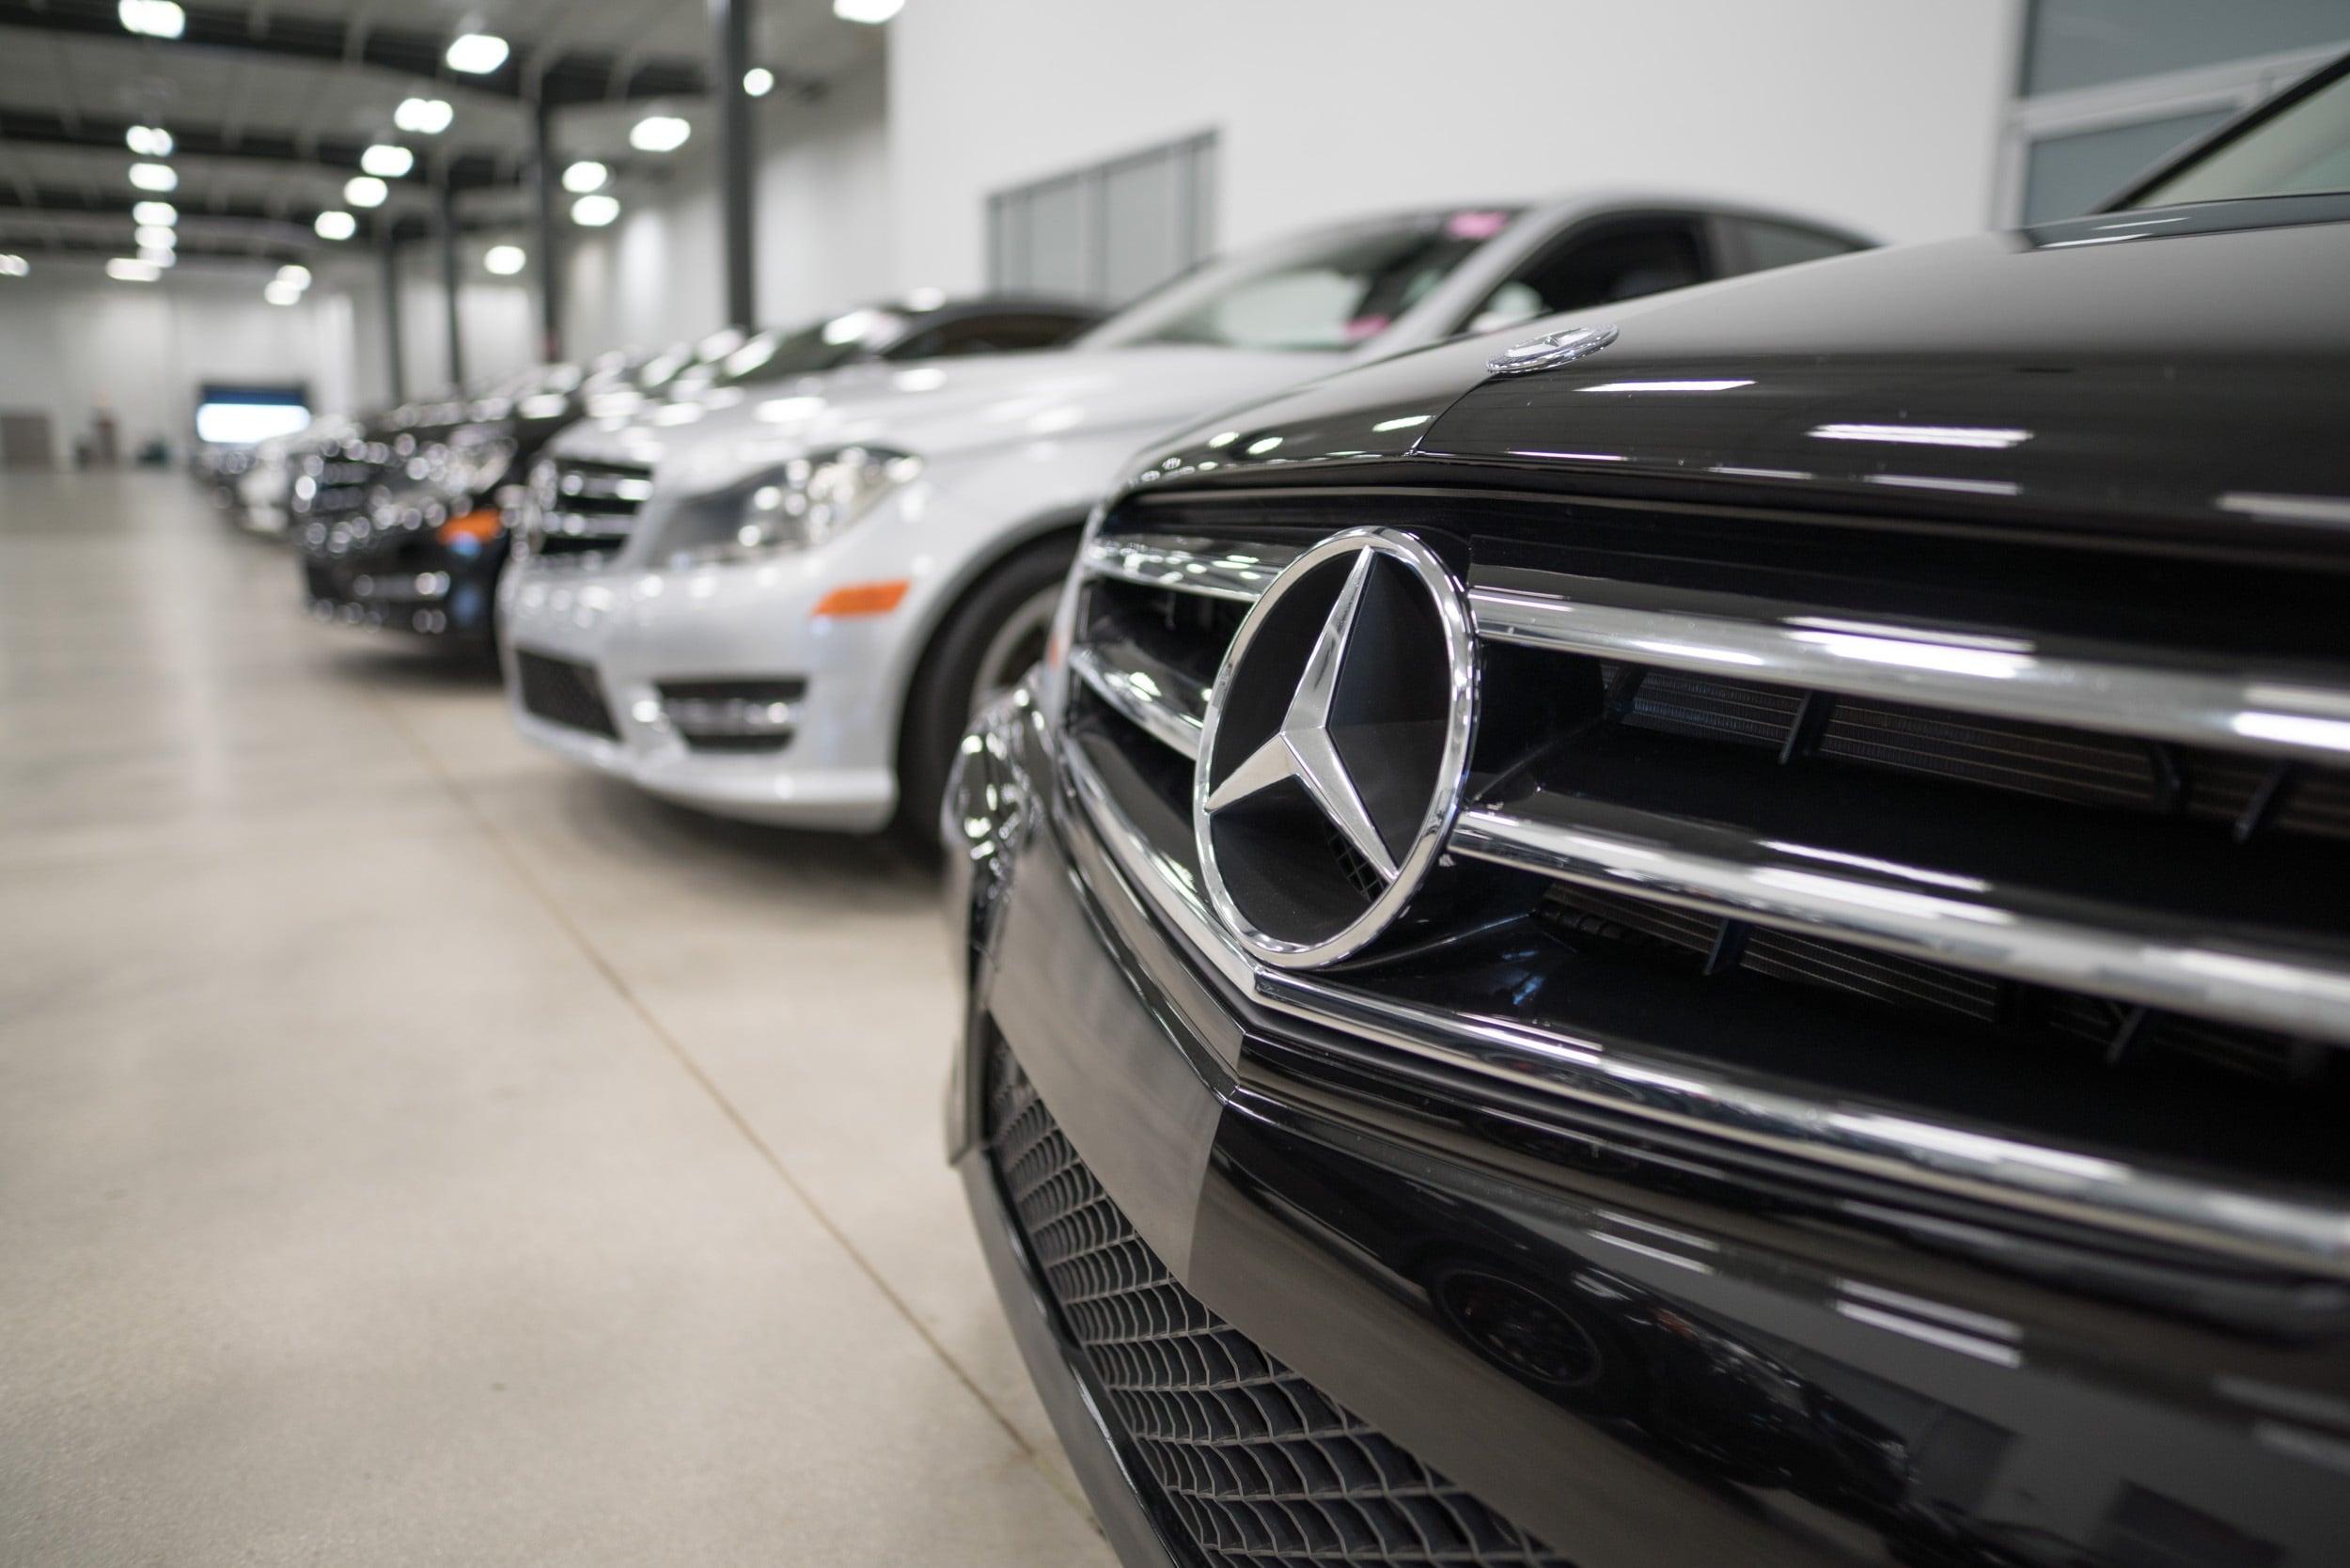 Mercedes benz dealer near me reno nv mercedes benz of reno for Reno mercedes benz dealer